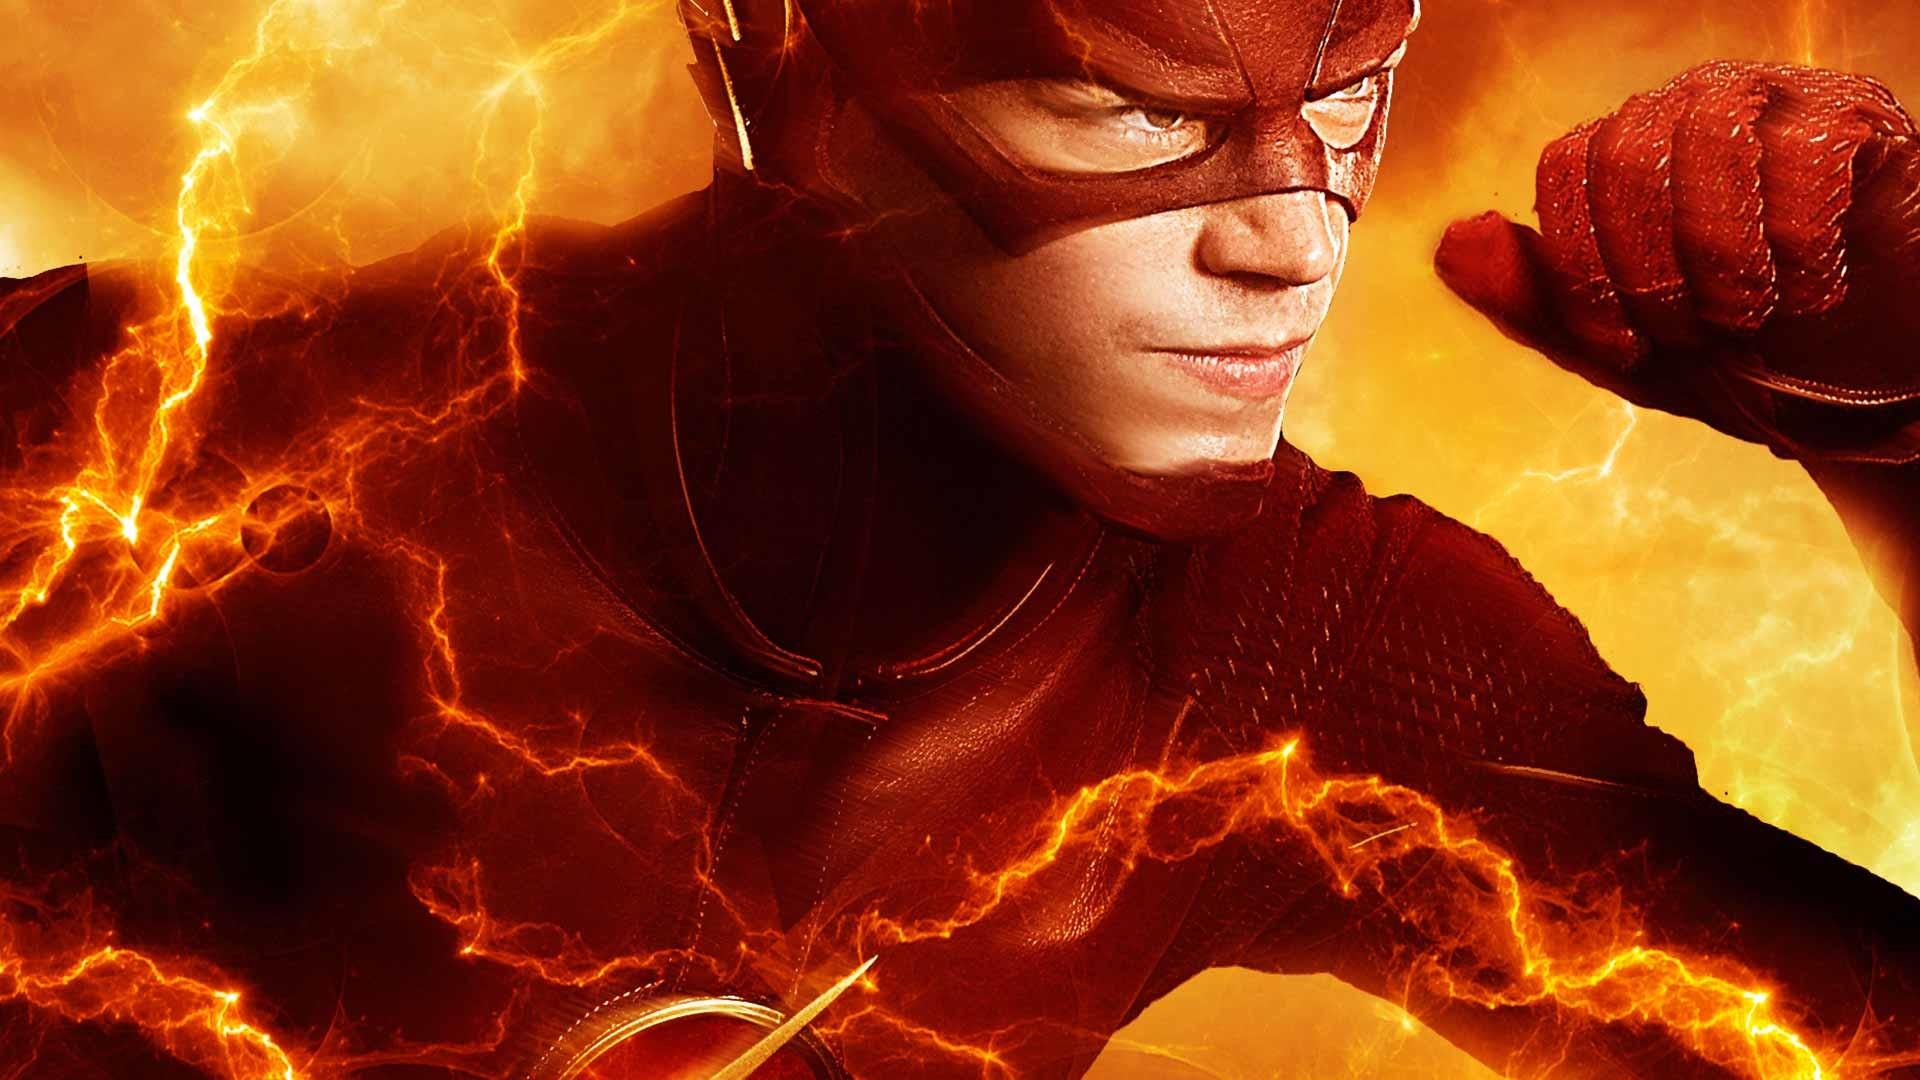 … imagenes-the-flash-serie-tv-en-hd …